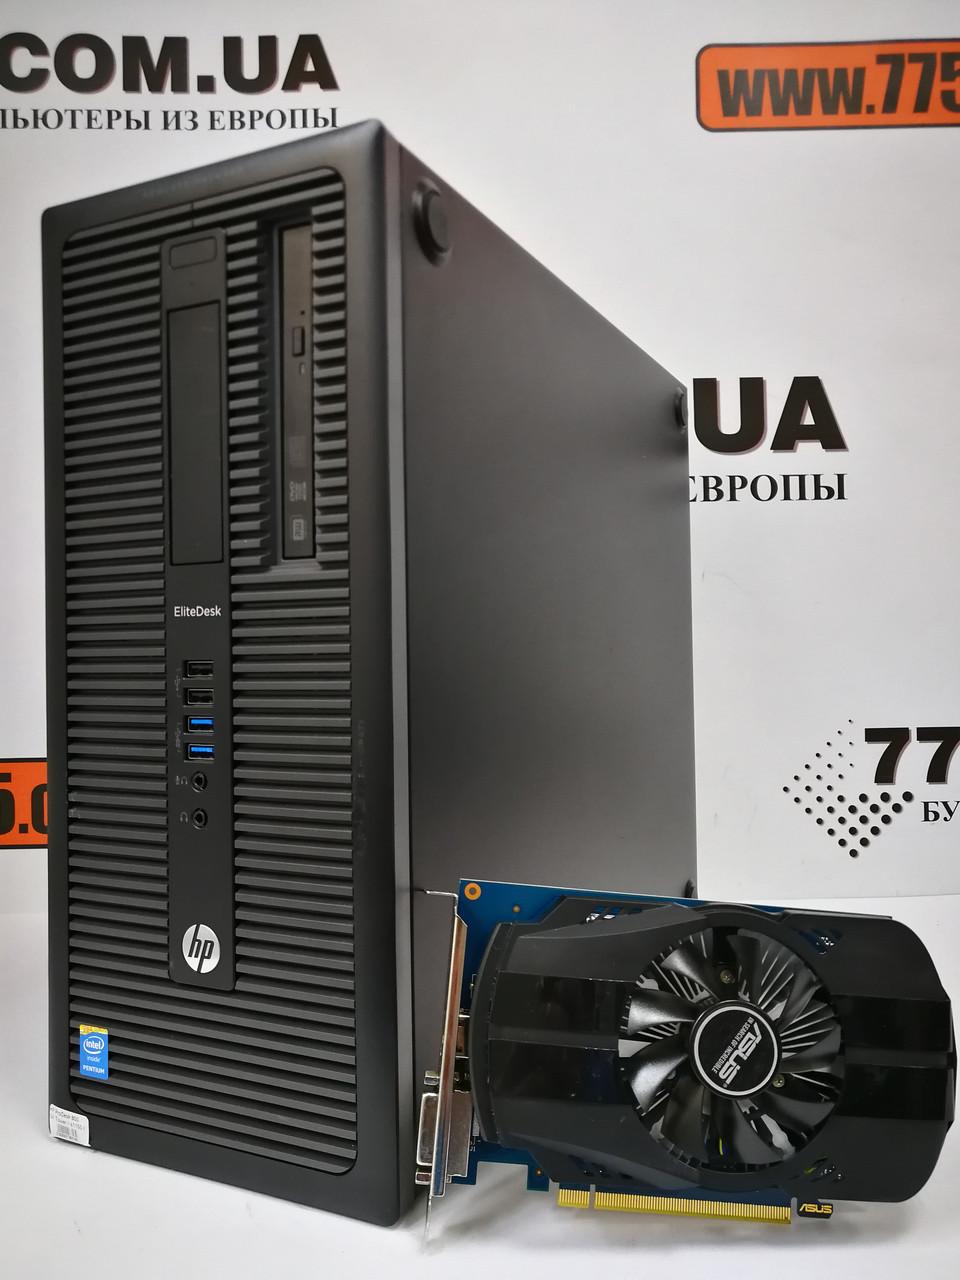 Компьютер HP 800 G1 Tower, Intel Core i3-4130 3.4GHz, RAM 8ГБ, SSD 120ГБ + HDD 500ГБ, GeForce GT 1030 2ГБ NEW